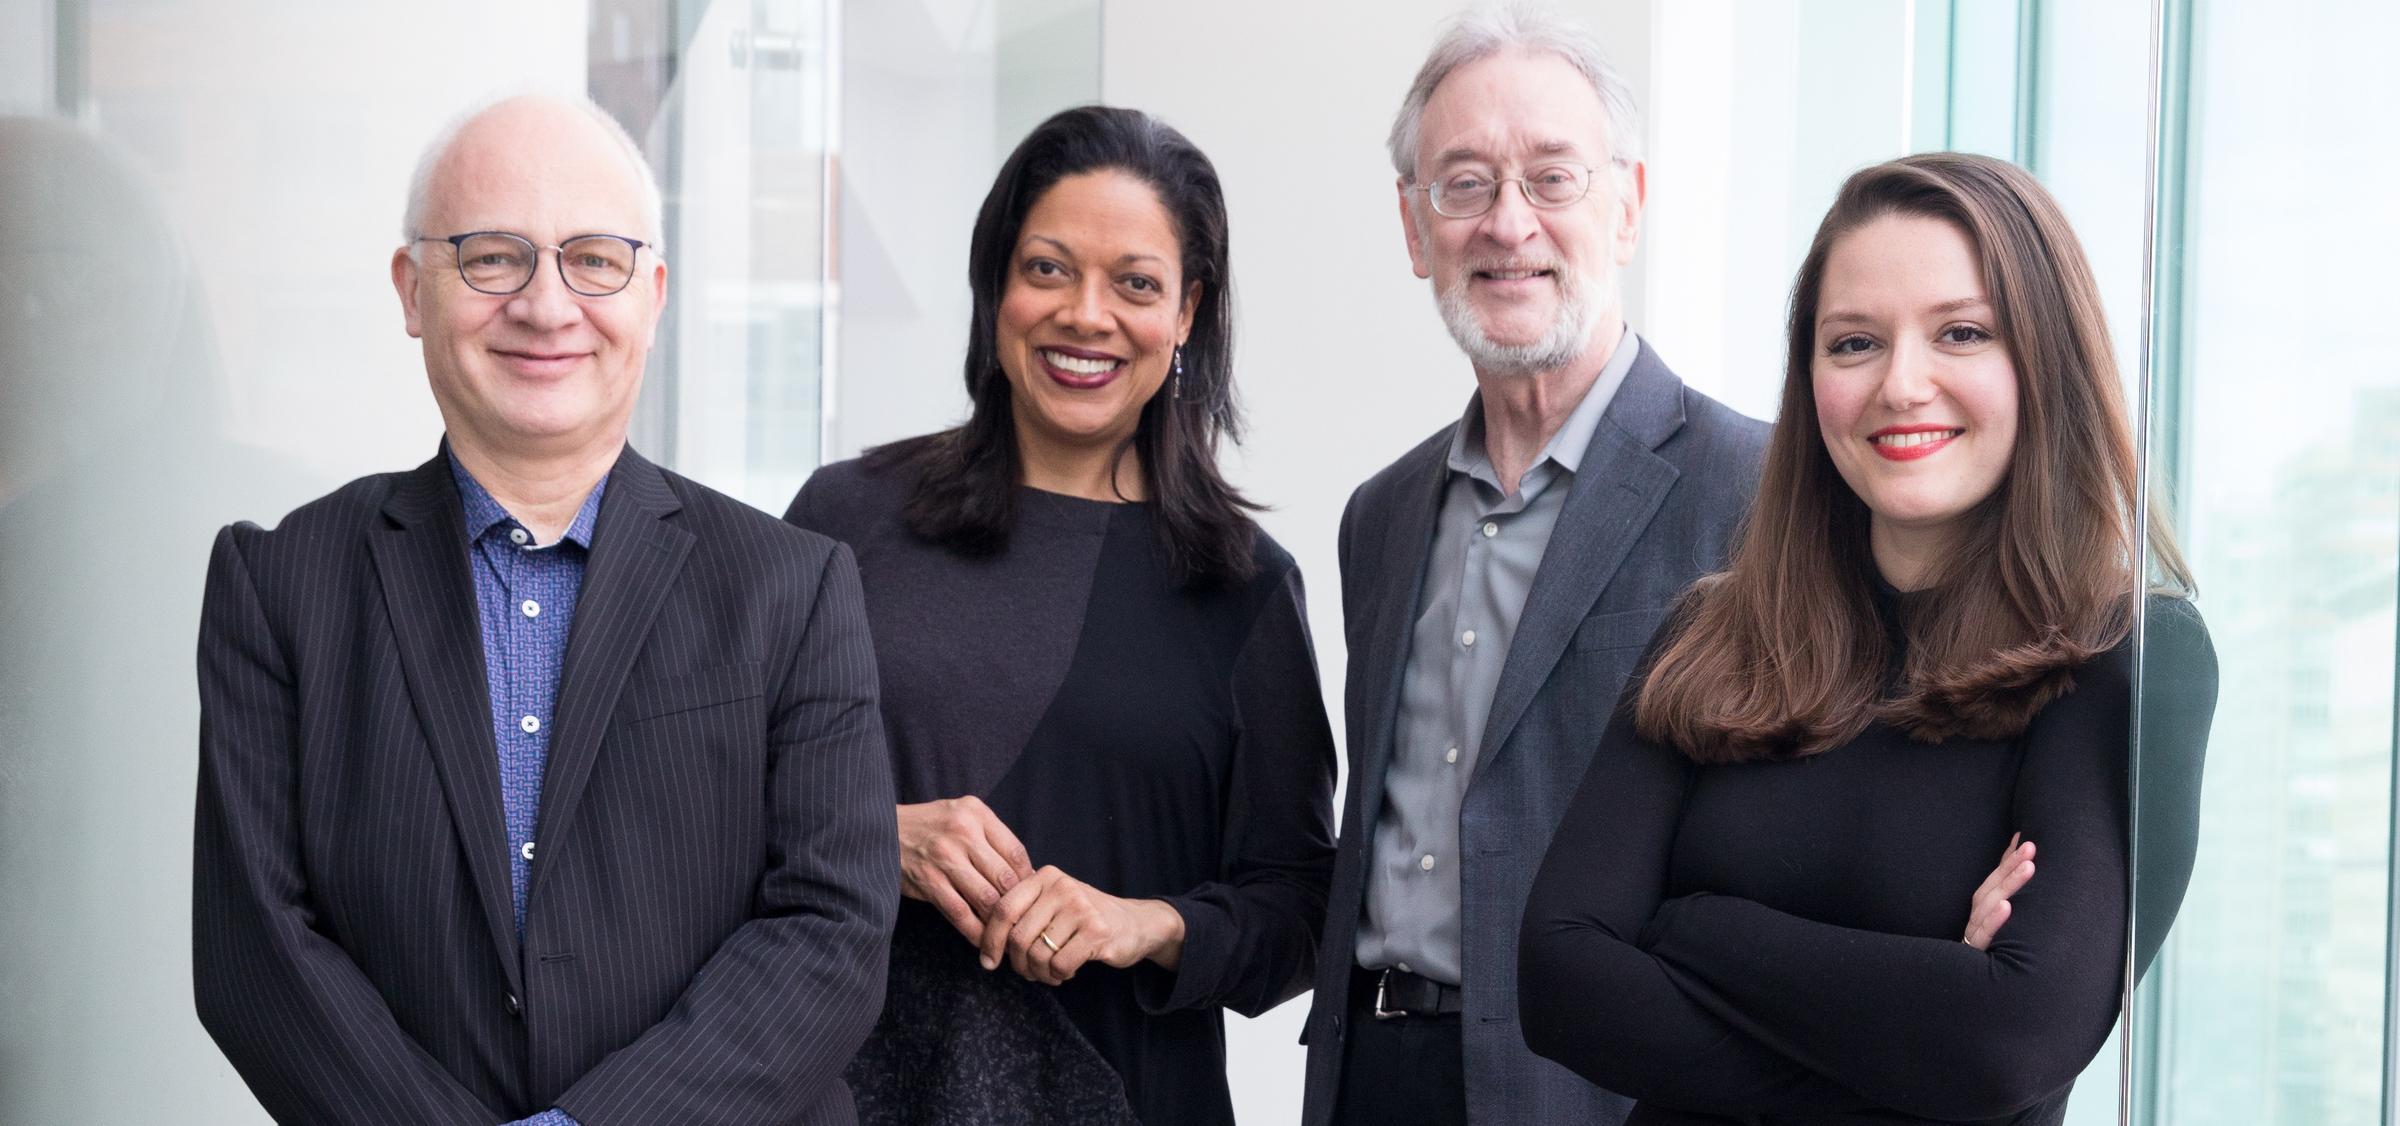 For Love Of Quartets: A Talk with Juilliard First Violinist Areta